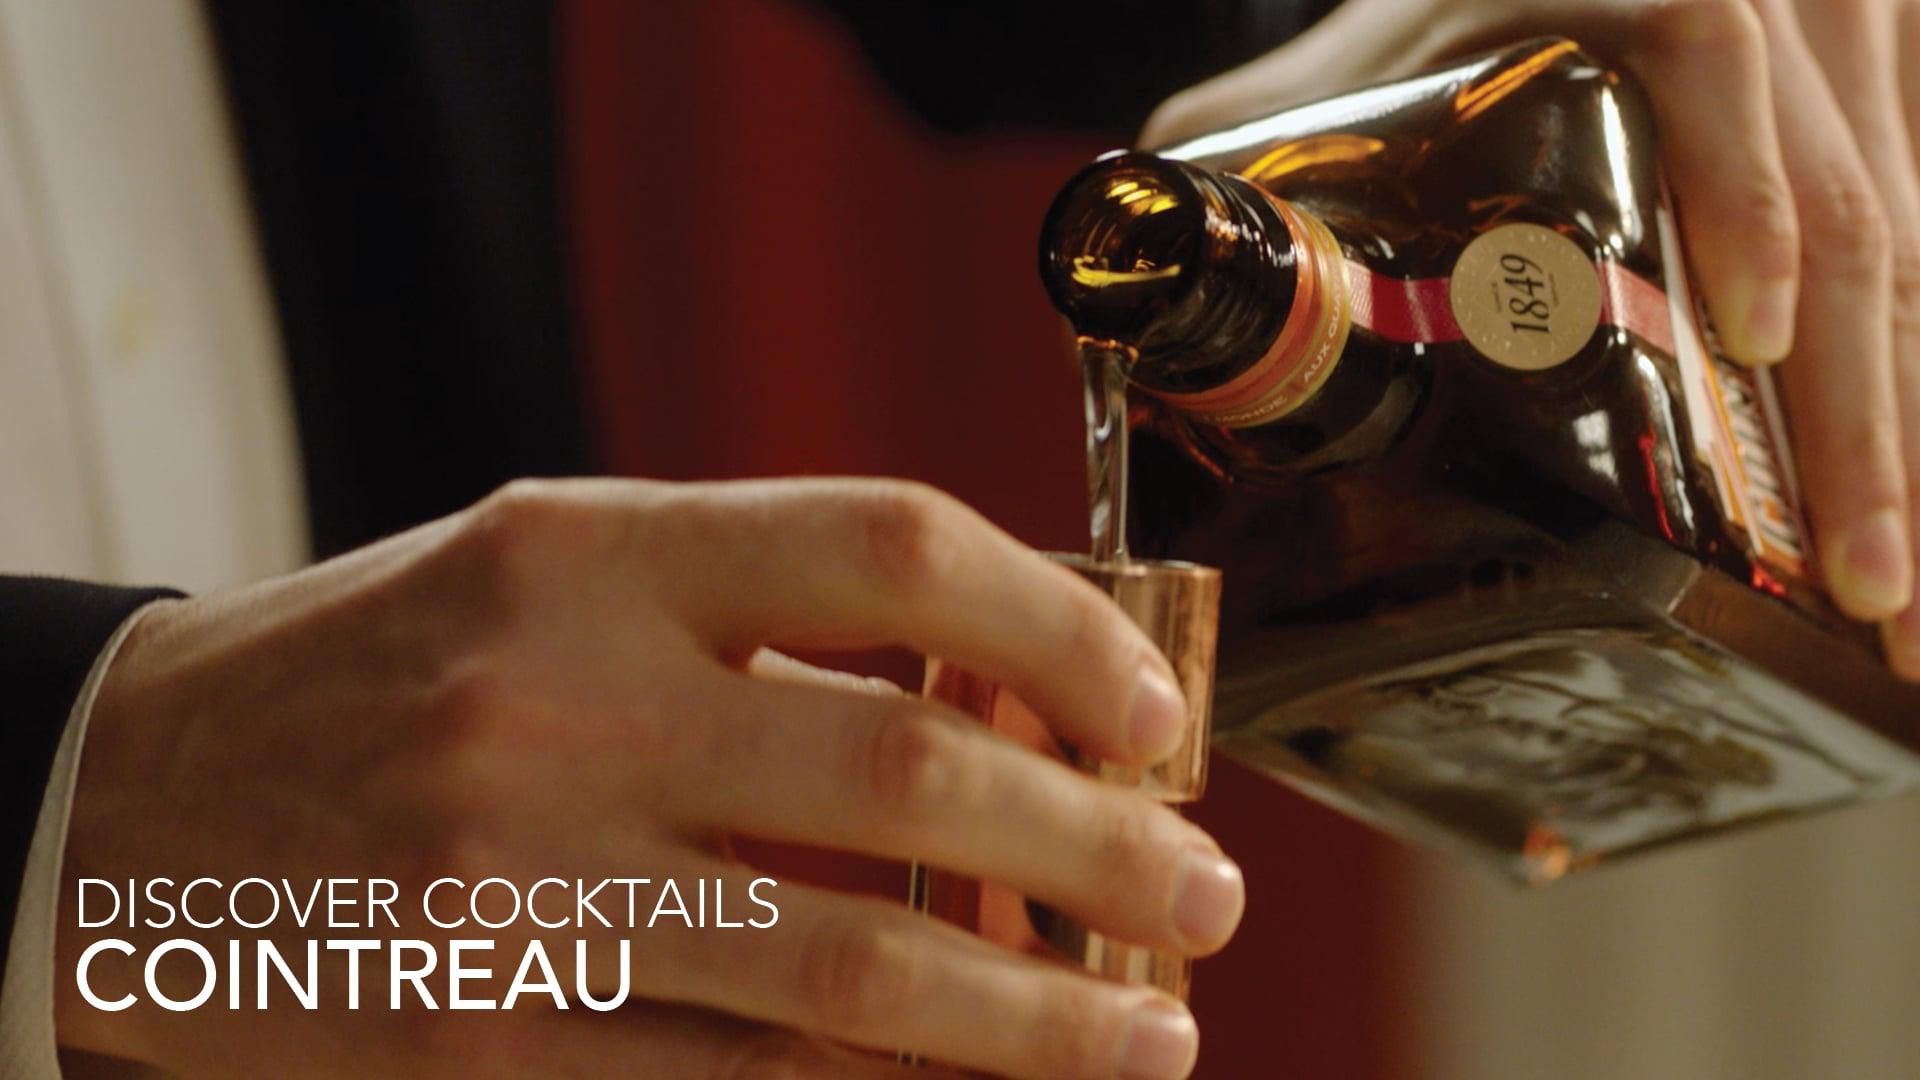 Cointreau - Discover Cocktails